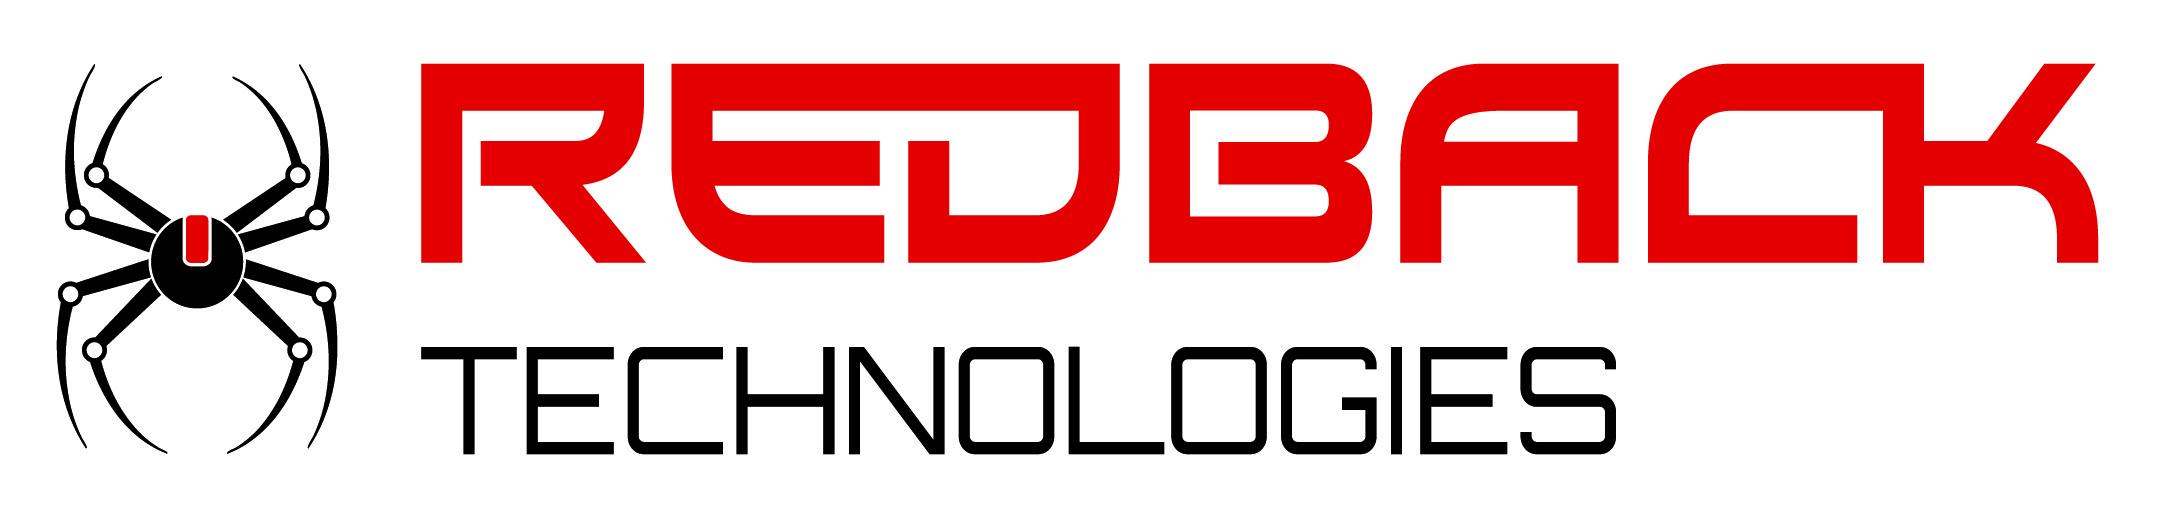 Redback Technologies